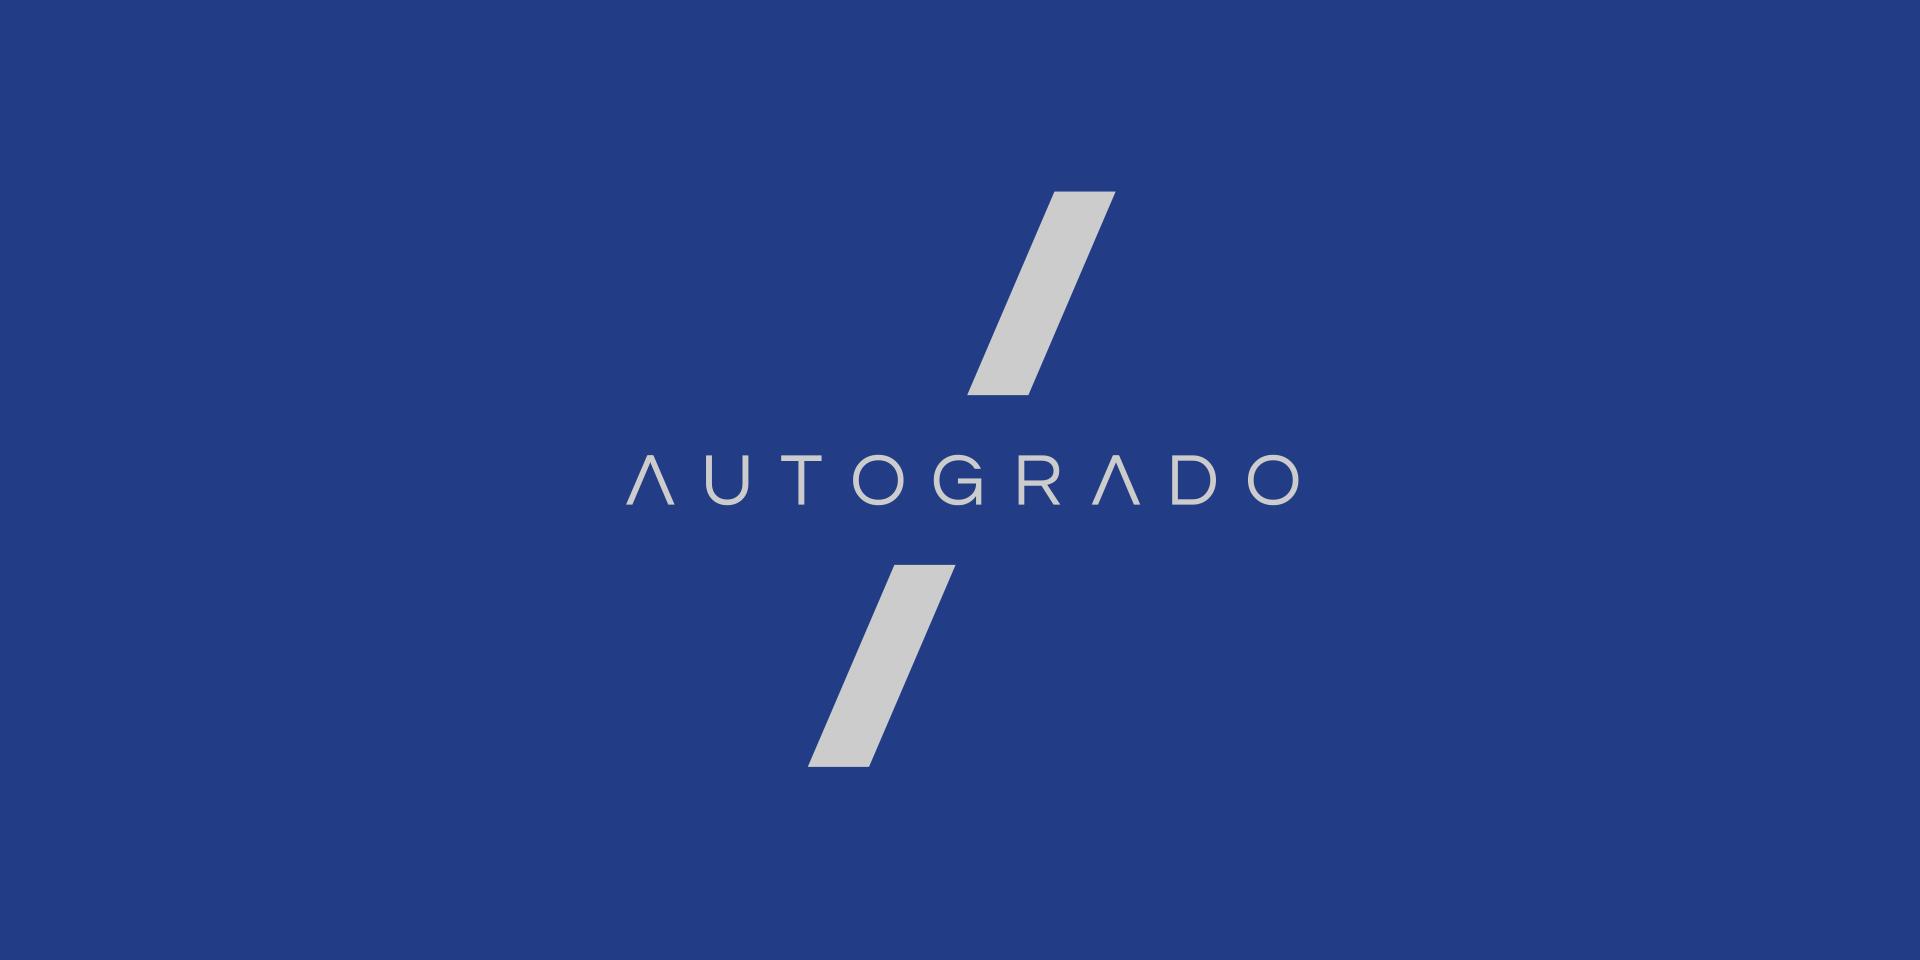 1920x960 .autogrado